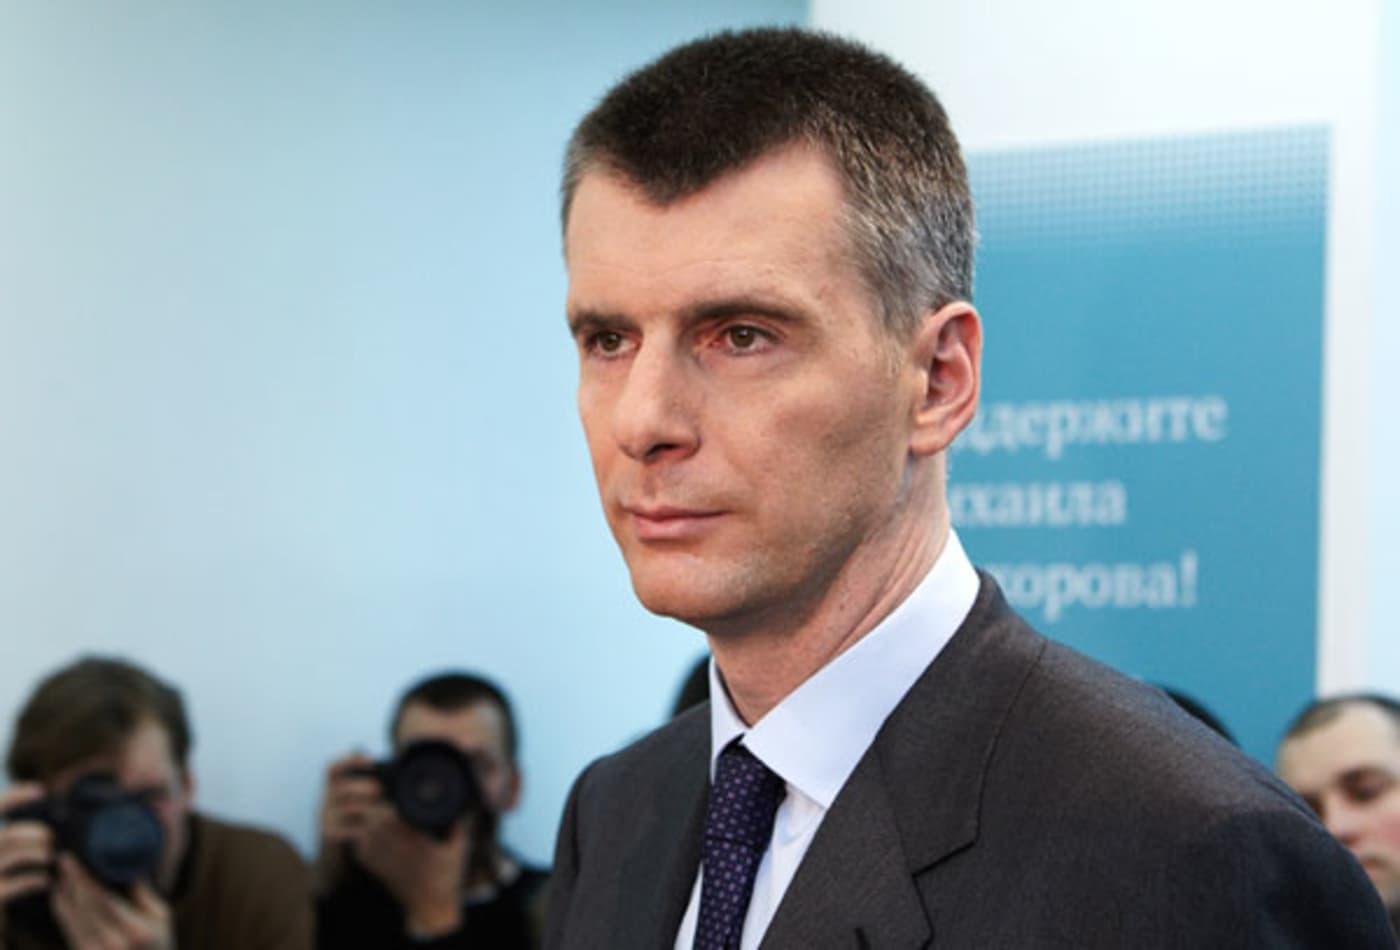 Mikhail-Prokhorov-Billionaire-Sports-Team-Owners-CNBC.jpg